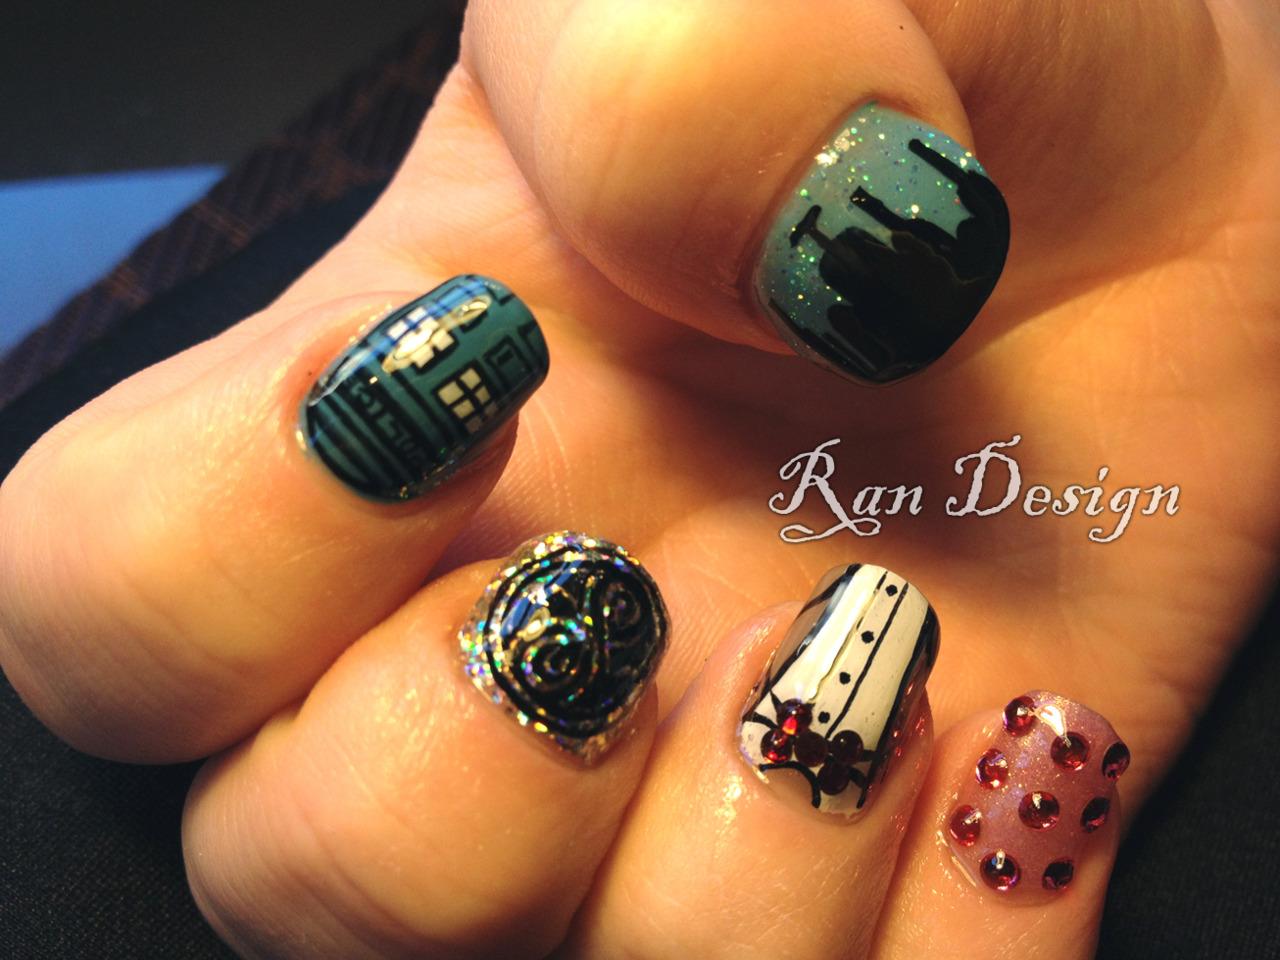 Amazing doctor who fingernail art pic global geek news doctor who fingernail art prinsesfo Choice Image